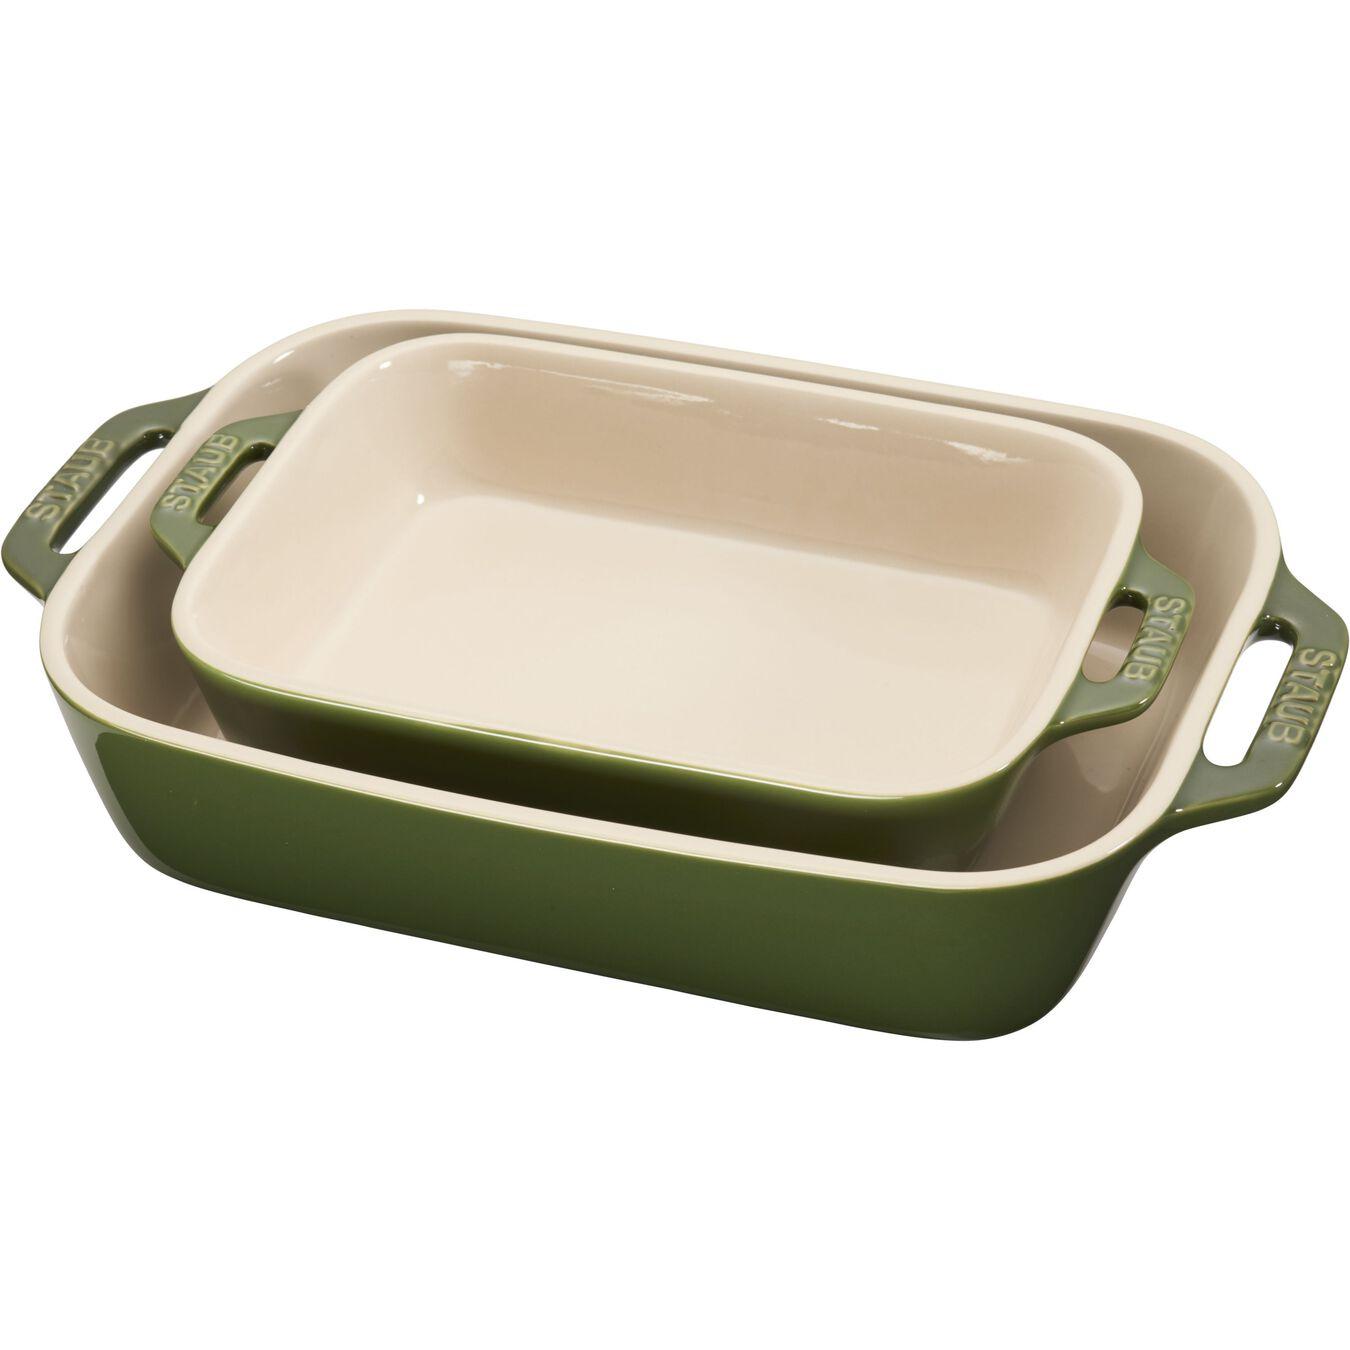 2 Piece rectangular Bakeware set, Basil-Green,,large 1